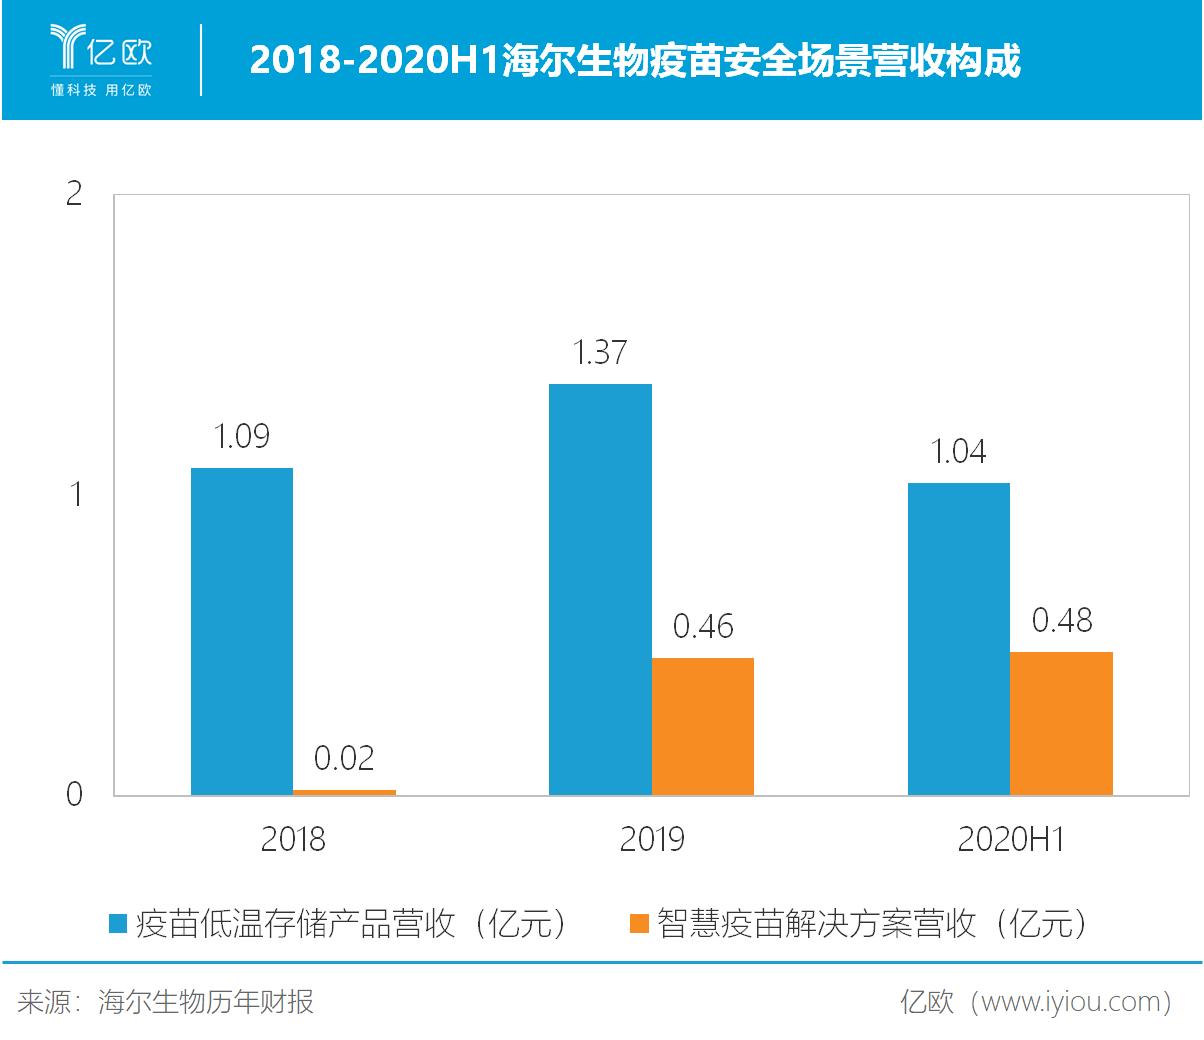 2018-2020H1海尔生物疫苗安全场景营收构成.png